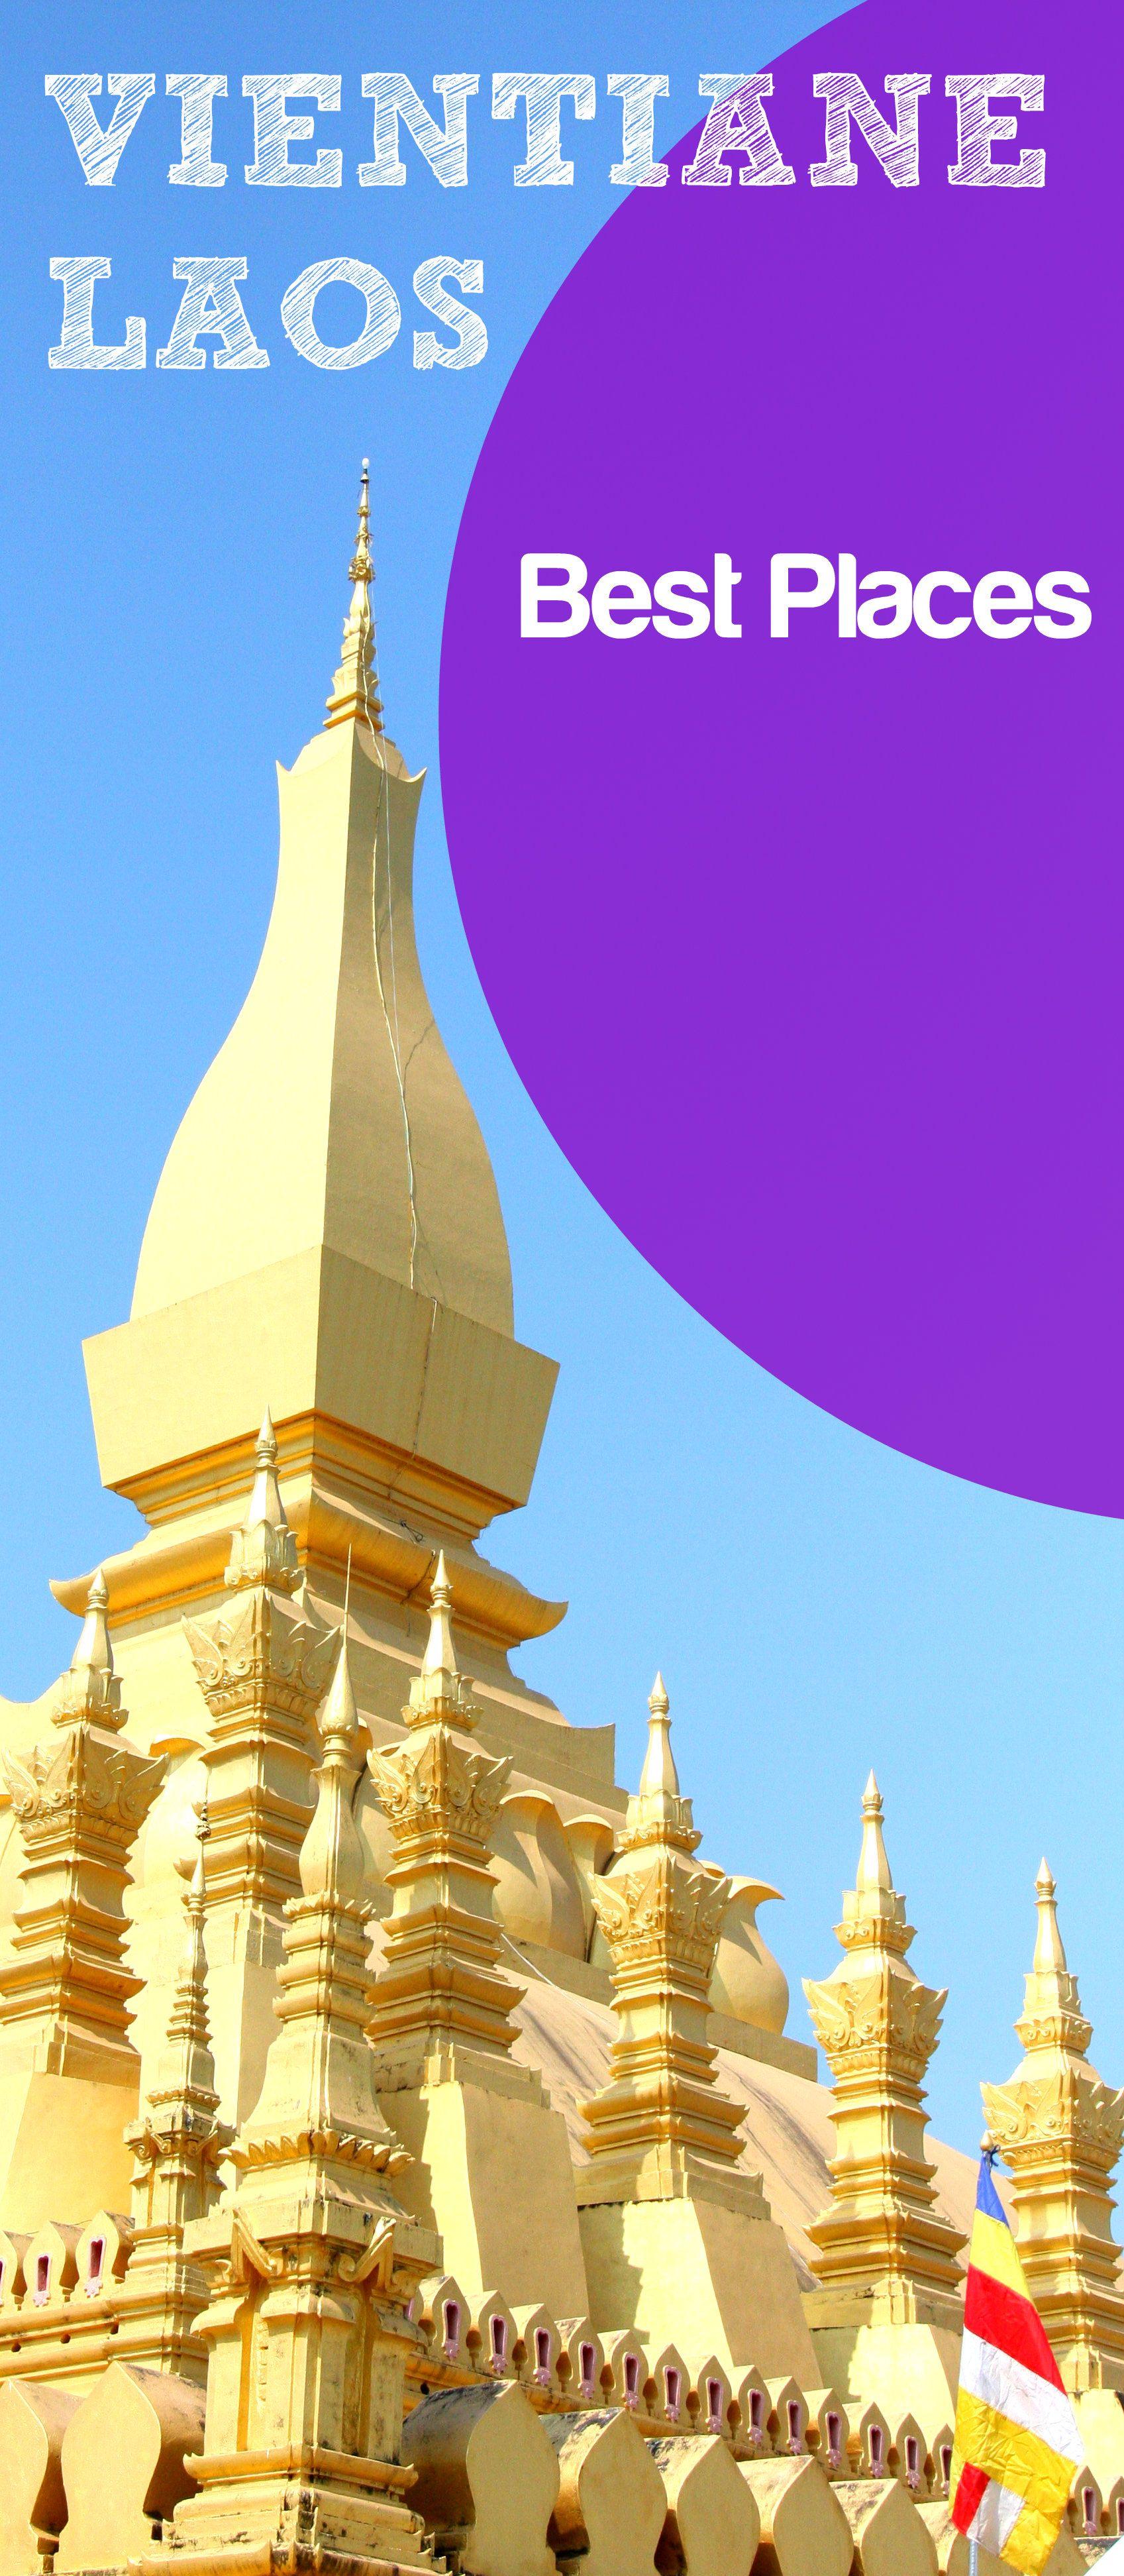 Best Places To Visit In The Capital Of Laos Vientiane Cityseacountry Com Vientiane Asienreisen Asien Reisen